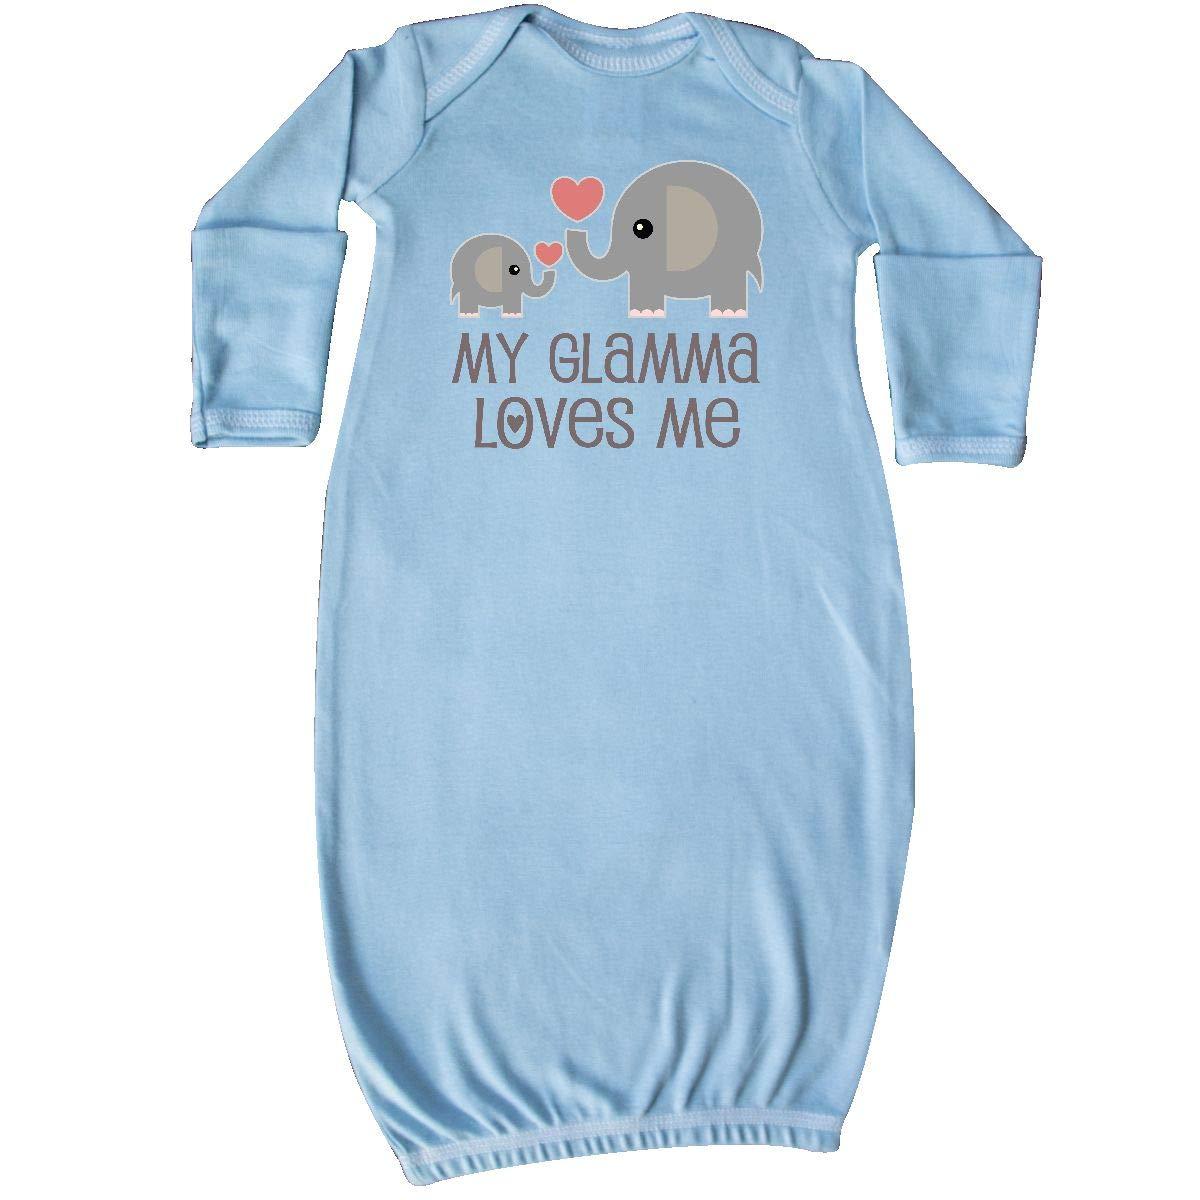 inktastic - My Glamma Loves Me Grandchild Gift Newborn Layette 14-204454-17-140-1418